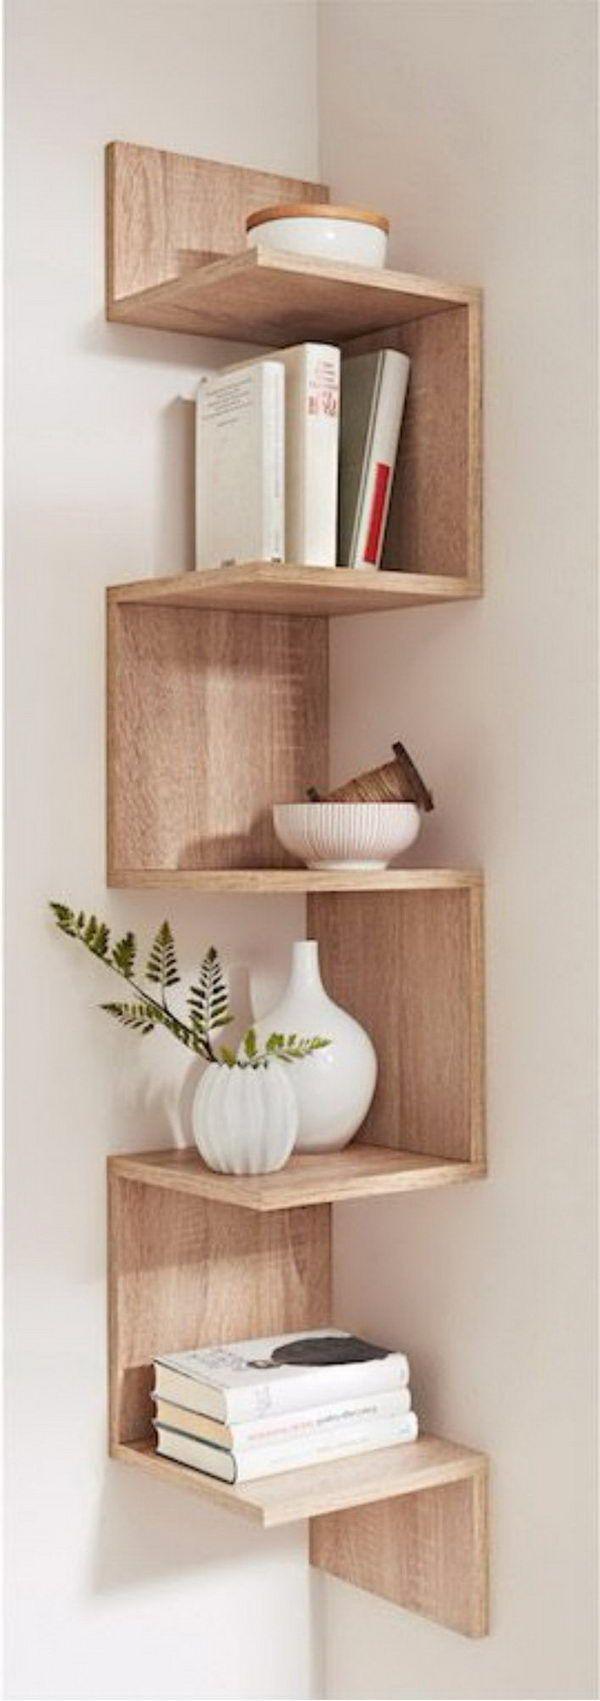 Mensole A Muro Ikea.Pinterest France